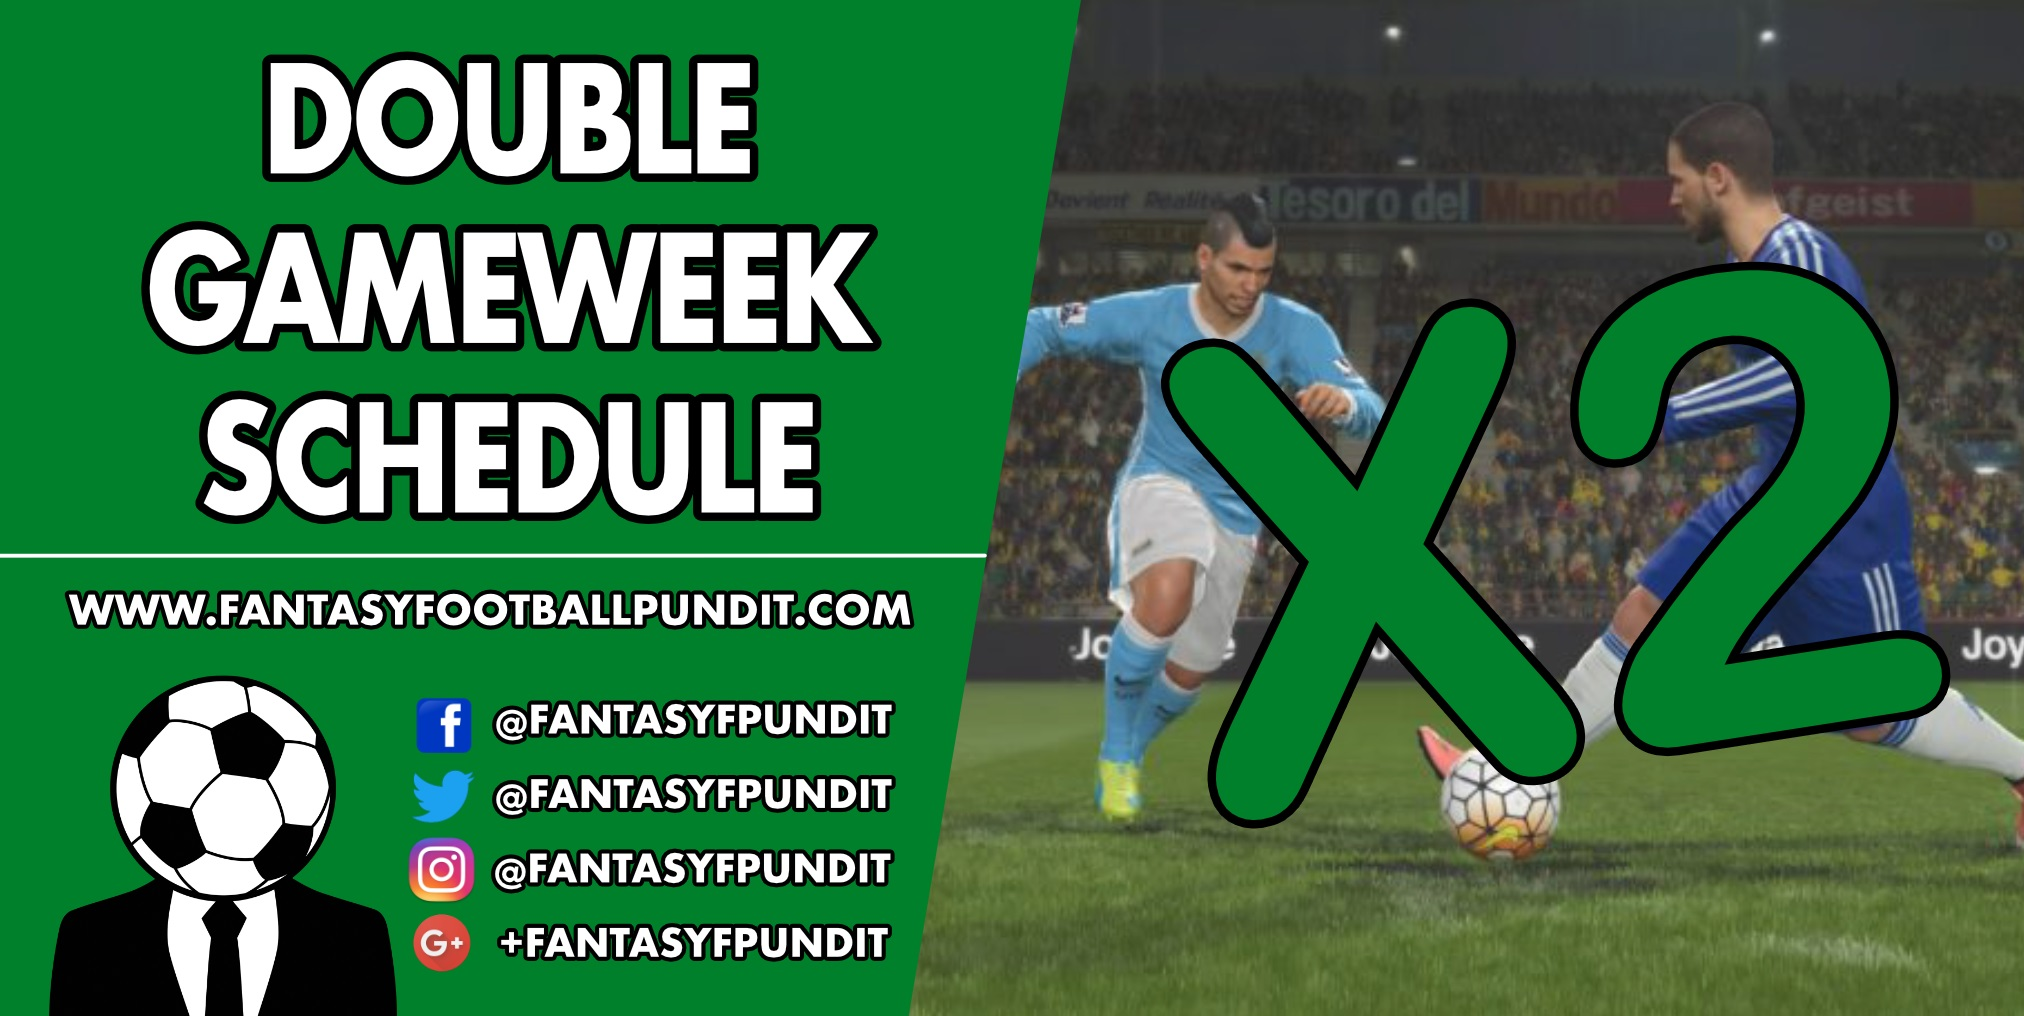 Double Gameweek Schedule